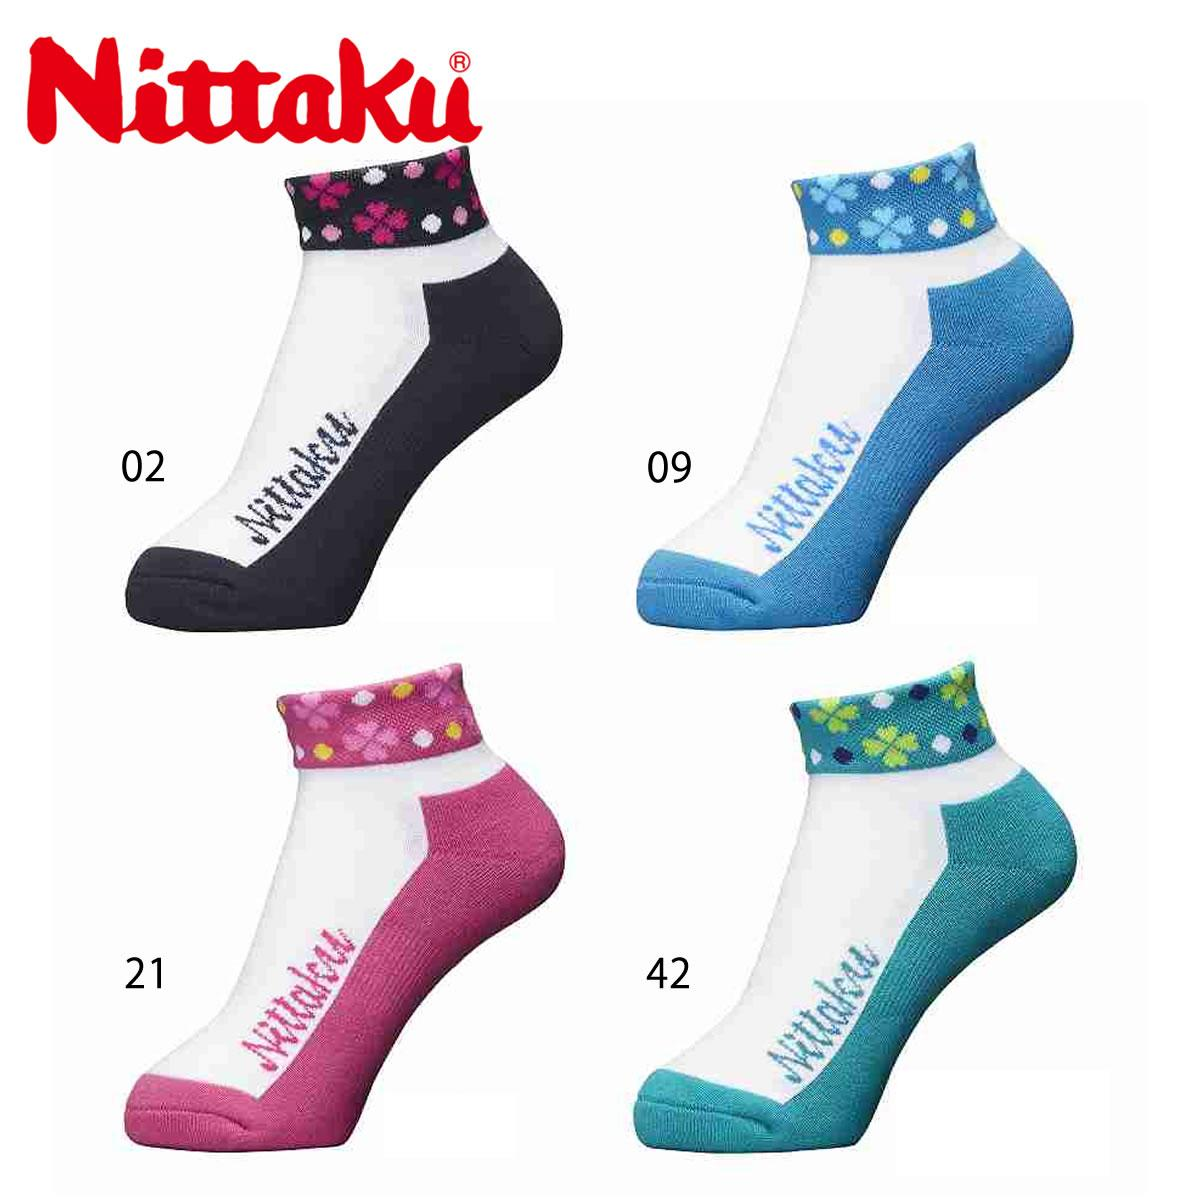 Nittaku NW-2979 クローバーソックス レディース 2020春夏 卓球ソックス 新品 ショップ 日本卓球 ニッタク メール便可 取り寄せ